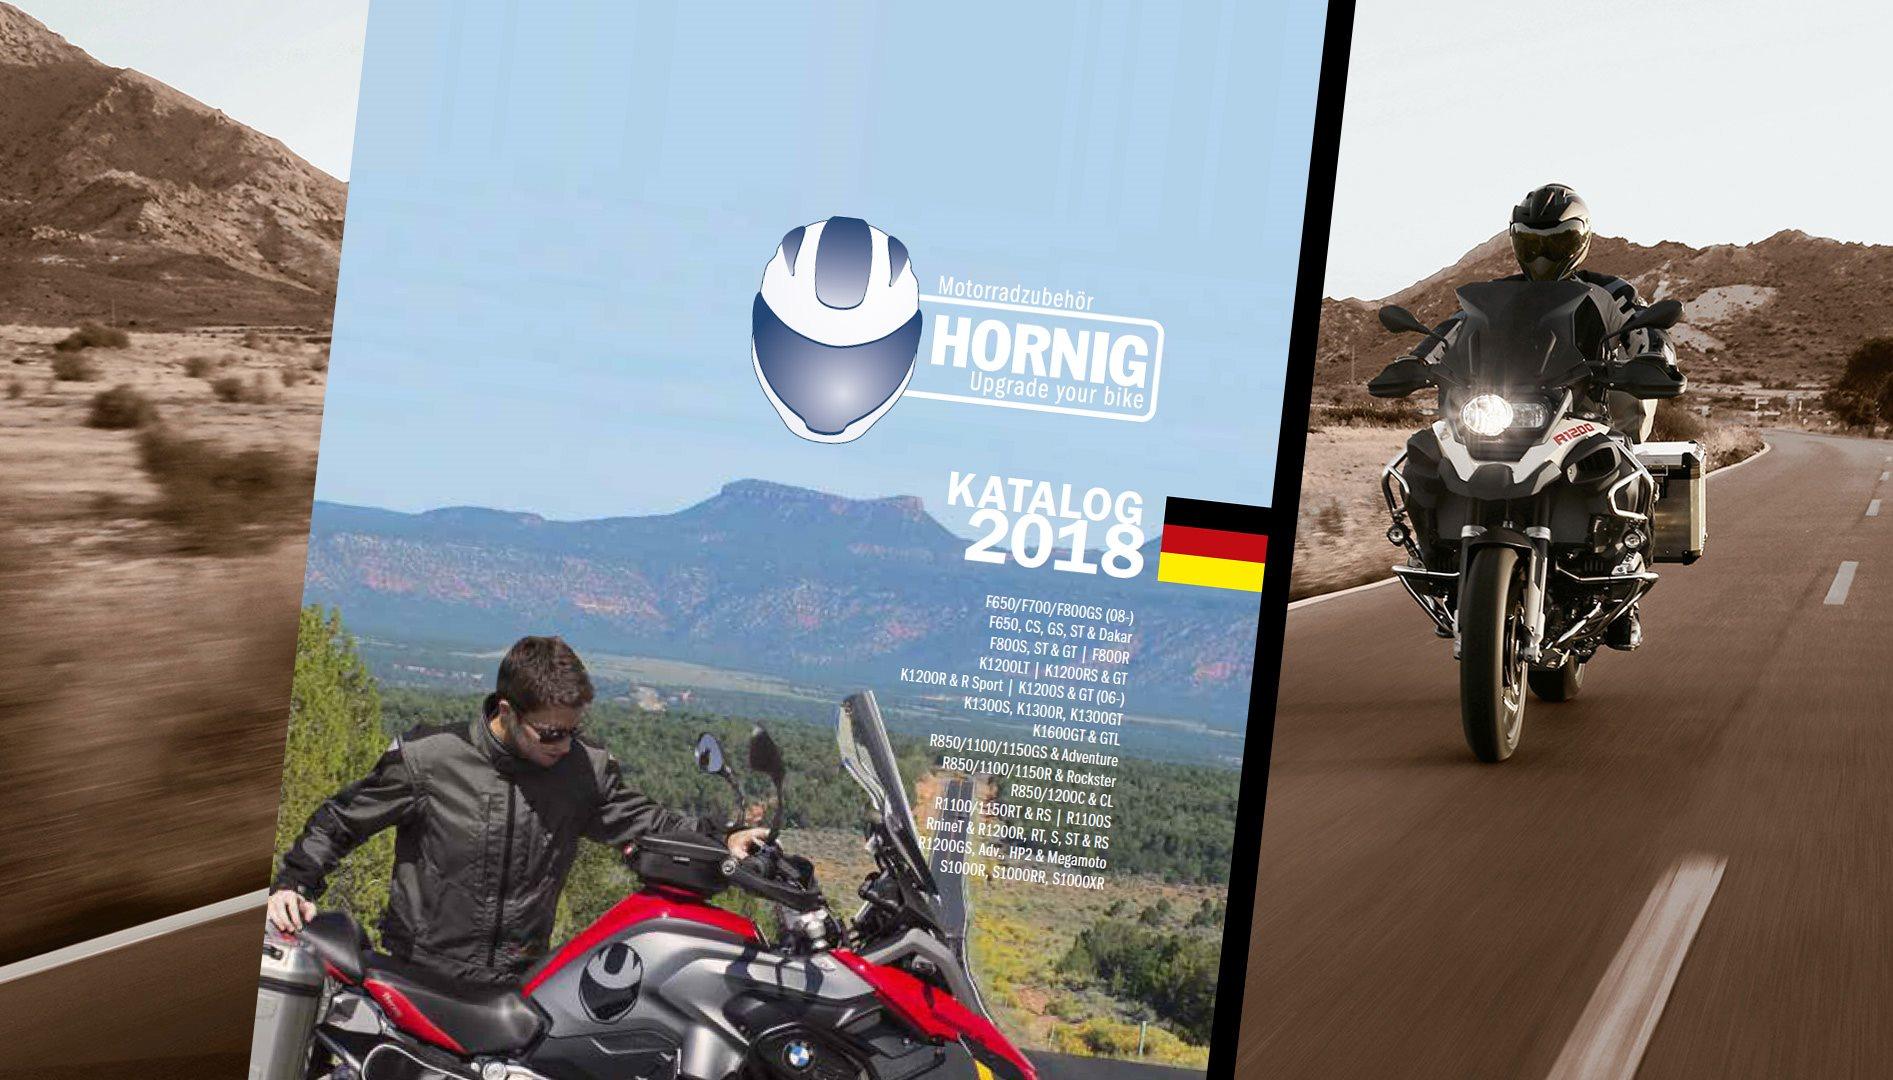 hornig bmw zubeh r katalog 2018 motorrad news. Black Bedroom Furniture Sets. Home Design Ideas